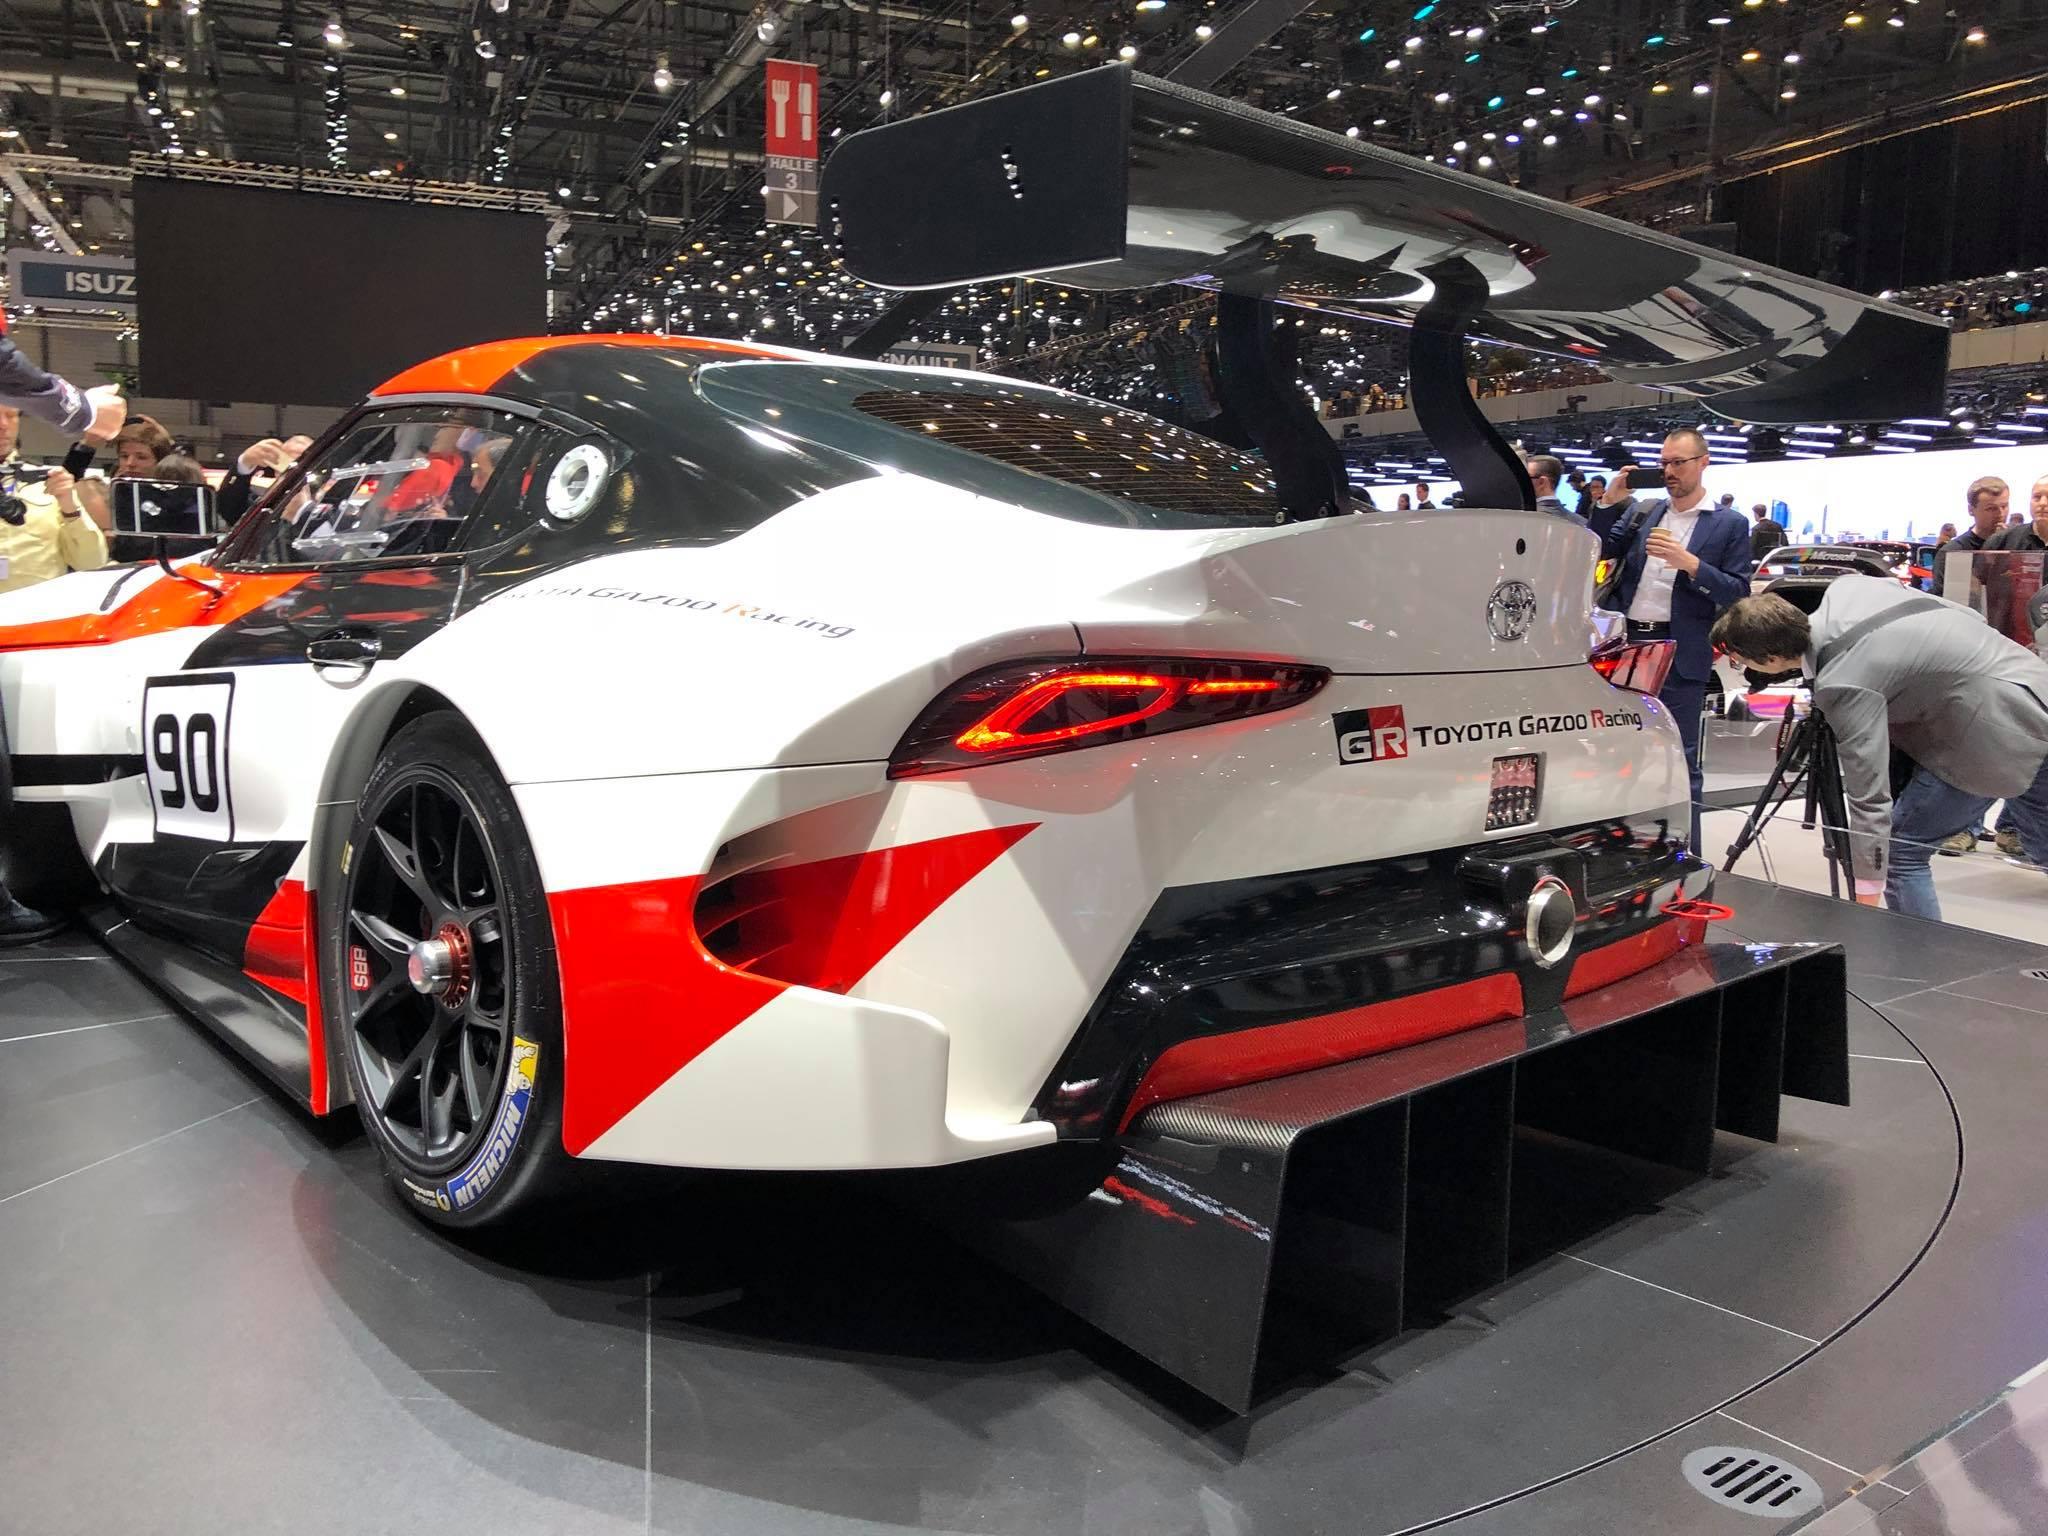 Toyota GR Supra Racing Concept (2)